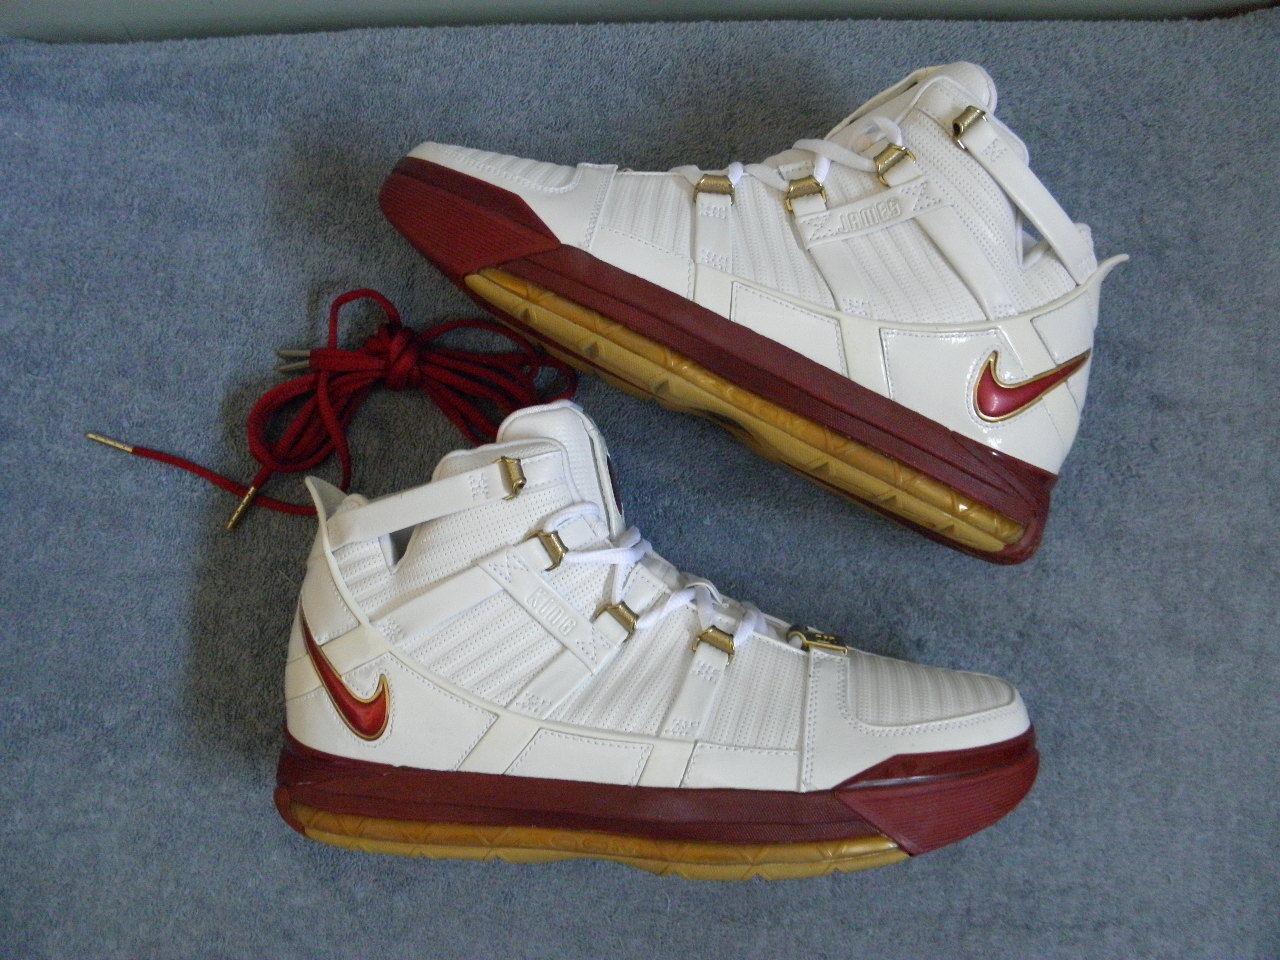 Nike Air Zoom Generation 3 III LeBron James PLAYOFFS sz 11 AREA CODE PLAYOFFS James PE RARE DS 932385